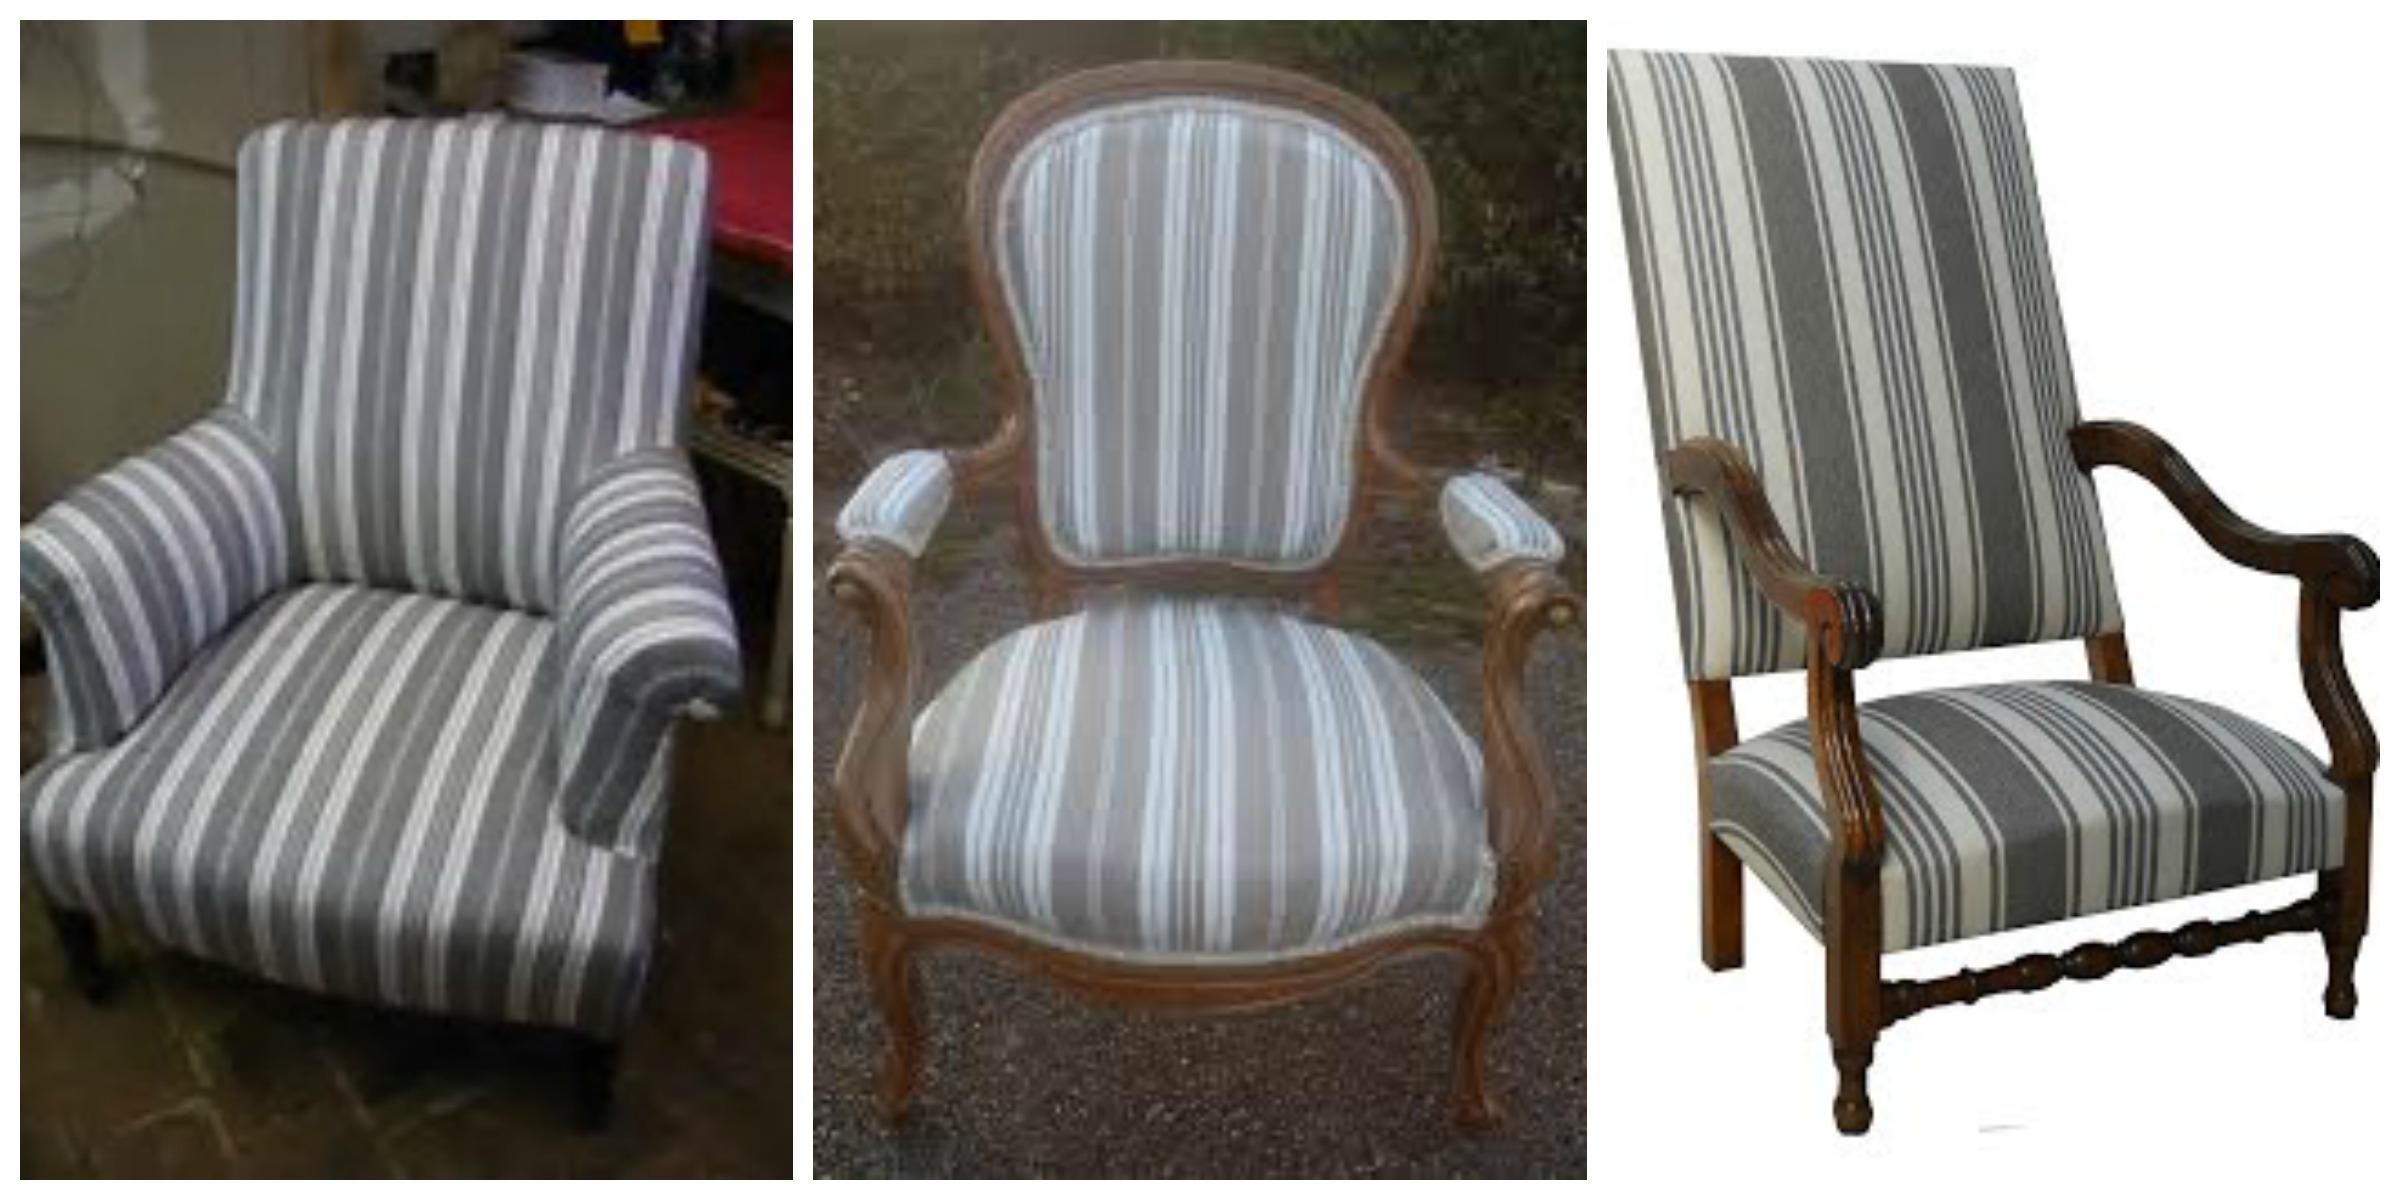 fauteuil toile matelas un her d 39 oc an. Black Bedroom Furniture Sets. Home Design Ideas